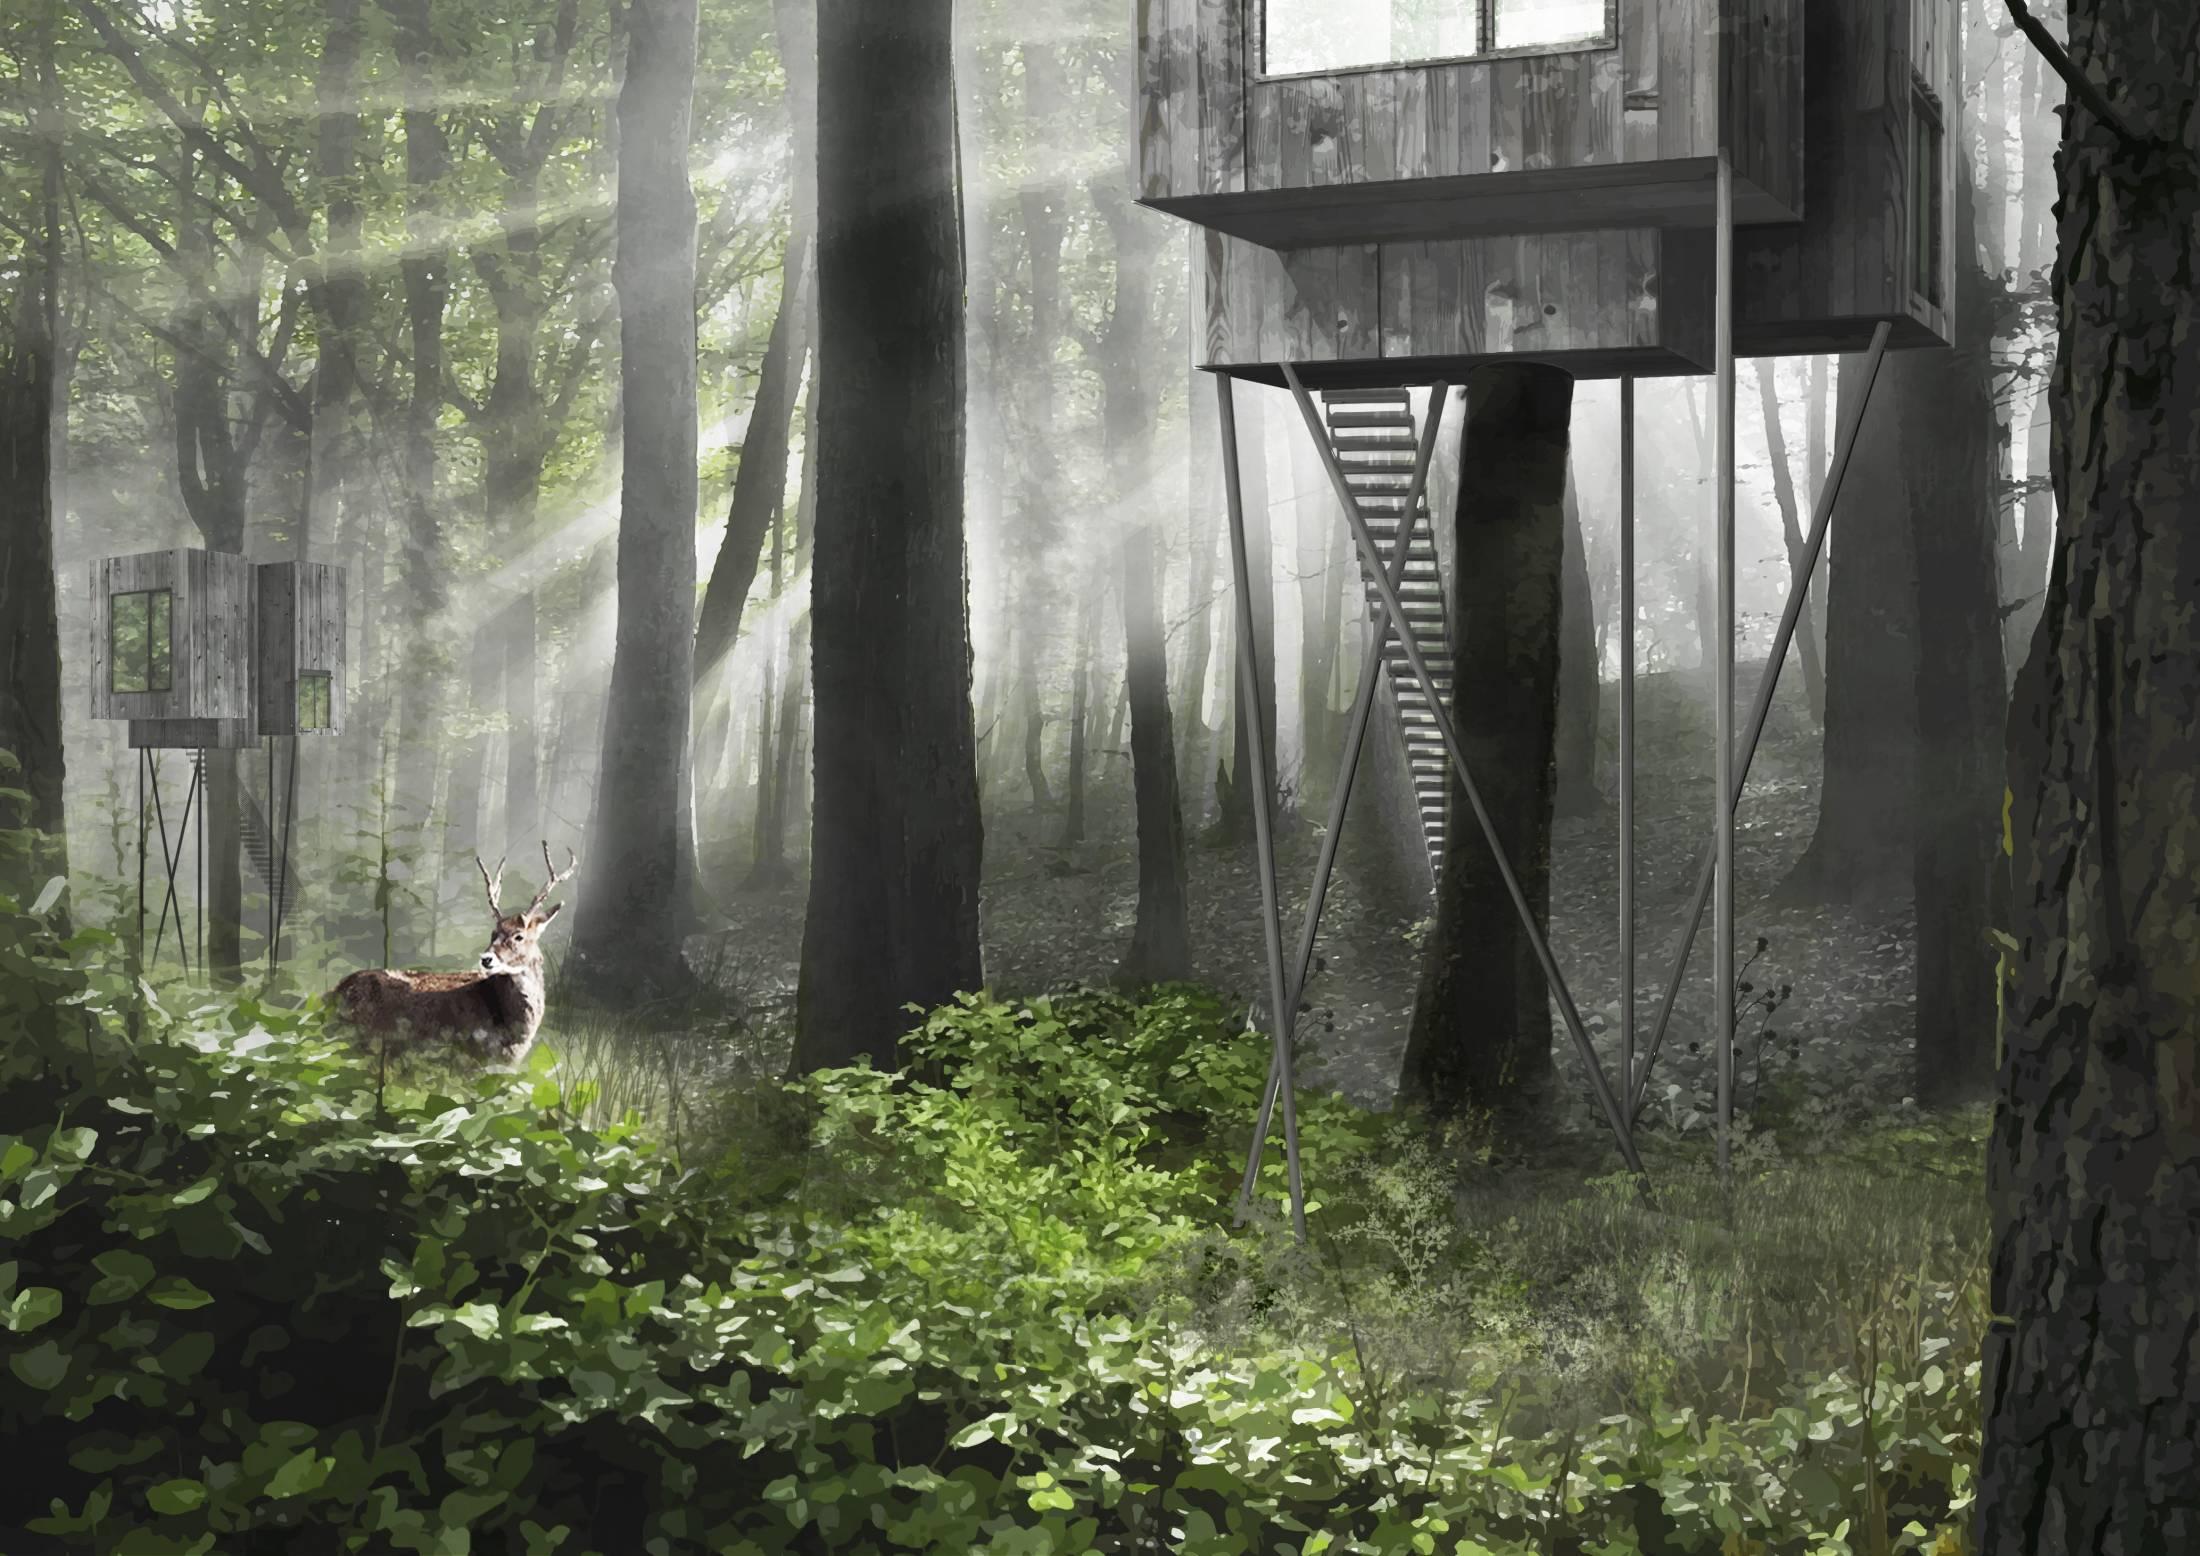 Treetop-Hotel_Denmark_lovtag_Architect-Sigurd-Larsen-axo-forest-EXTERIOR-VIEW-1100x778@2x.jpg